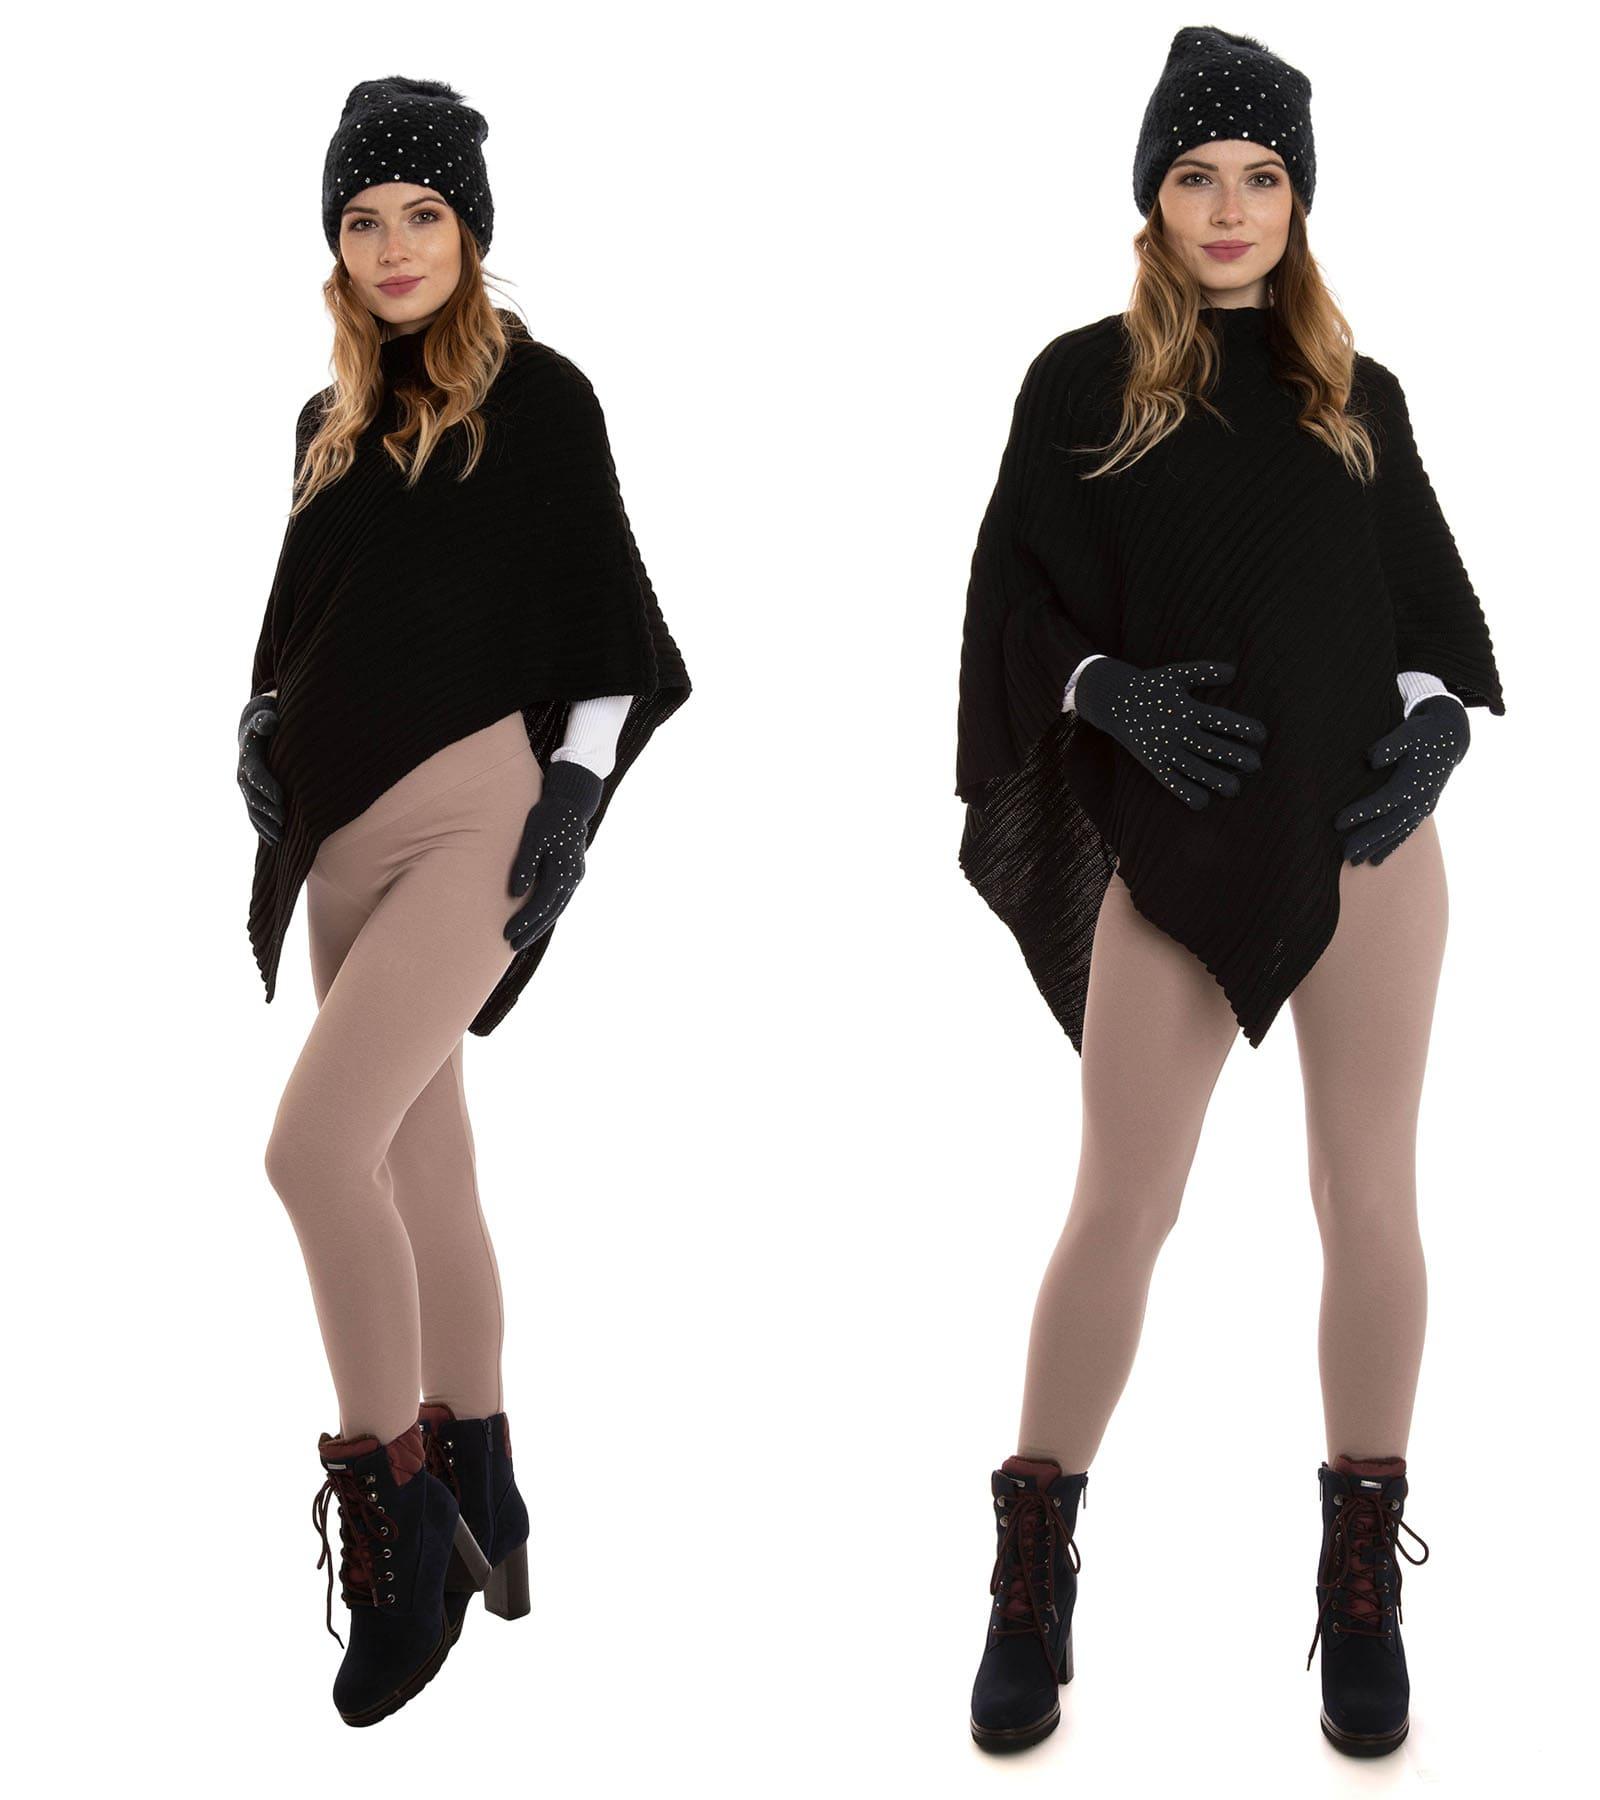 Ciepłe legginsy ciążowe, beżowe Bensini